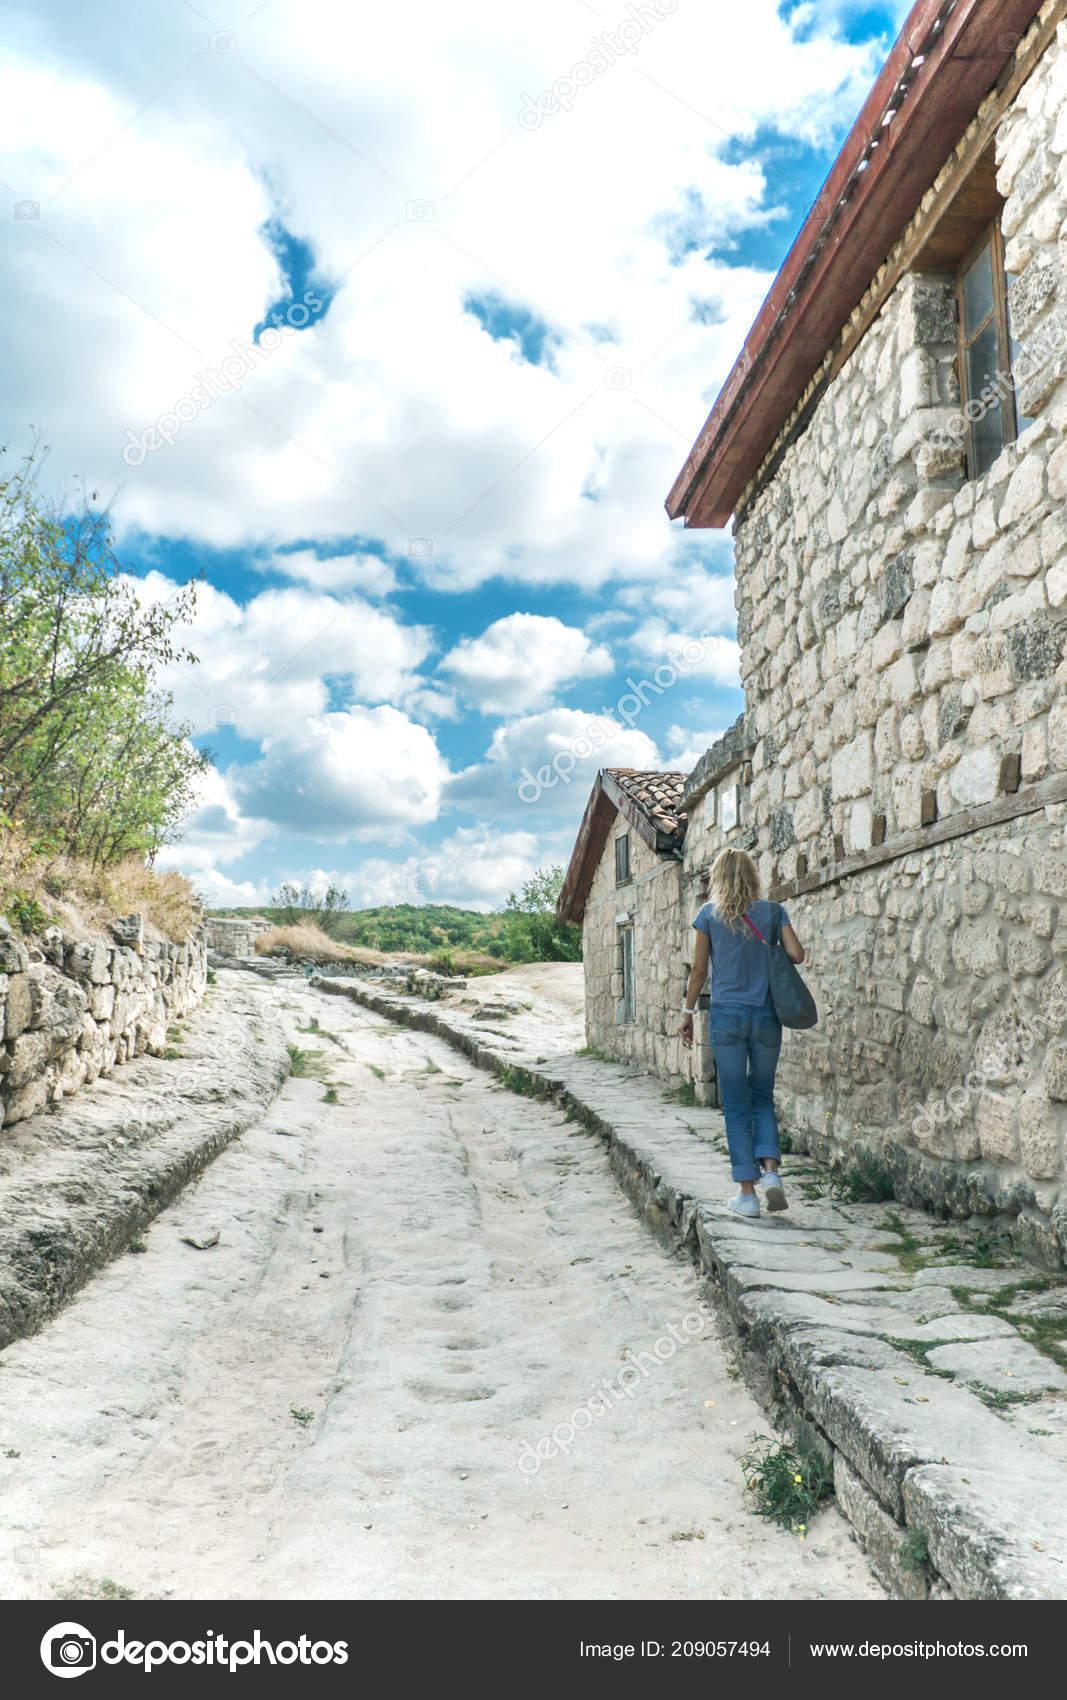 Crimea: a selection of sites